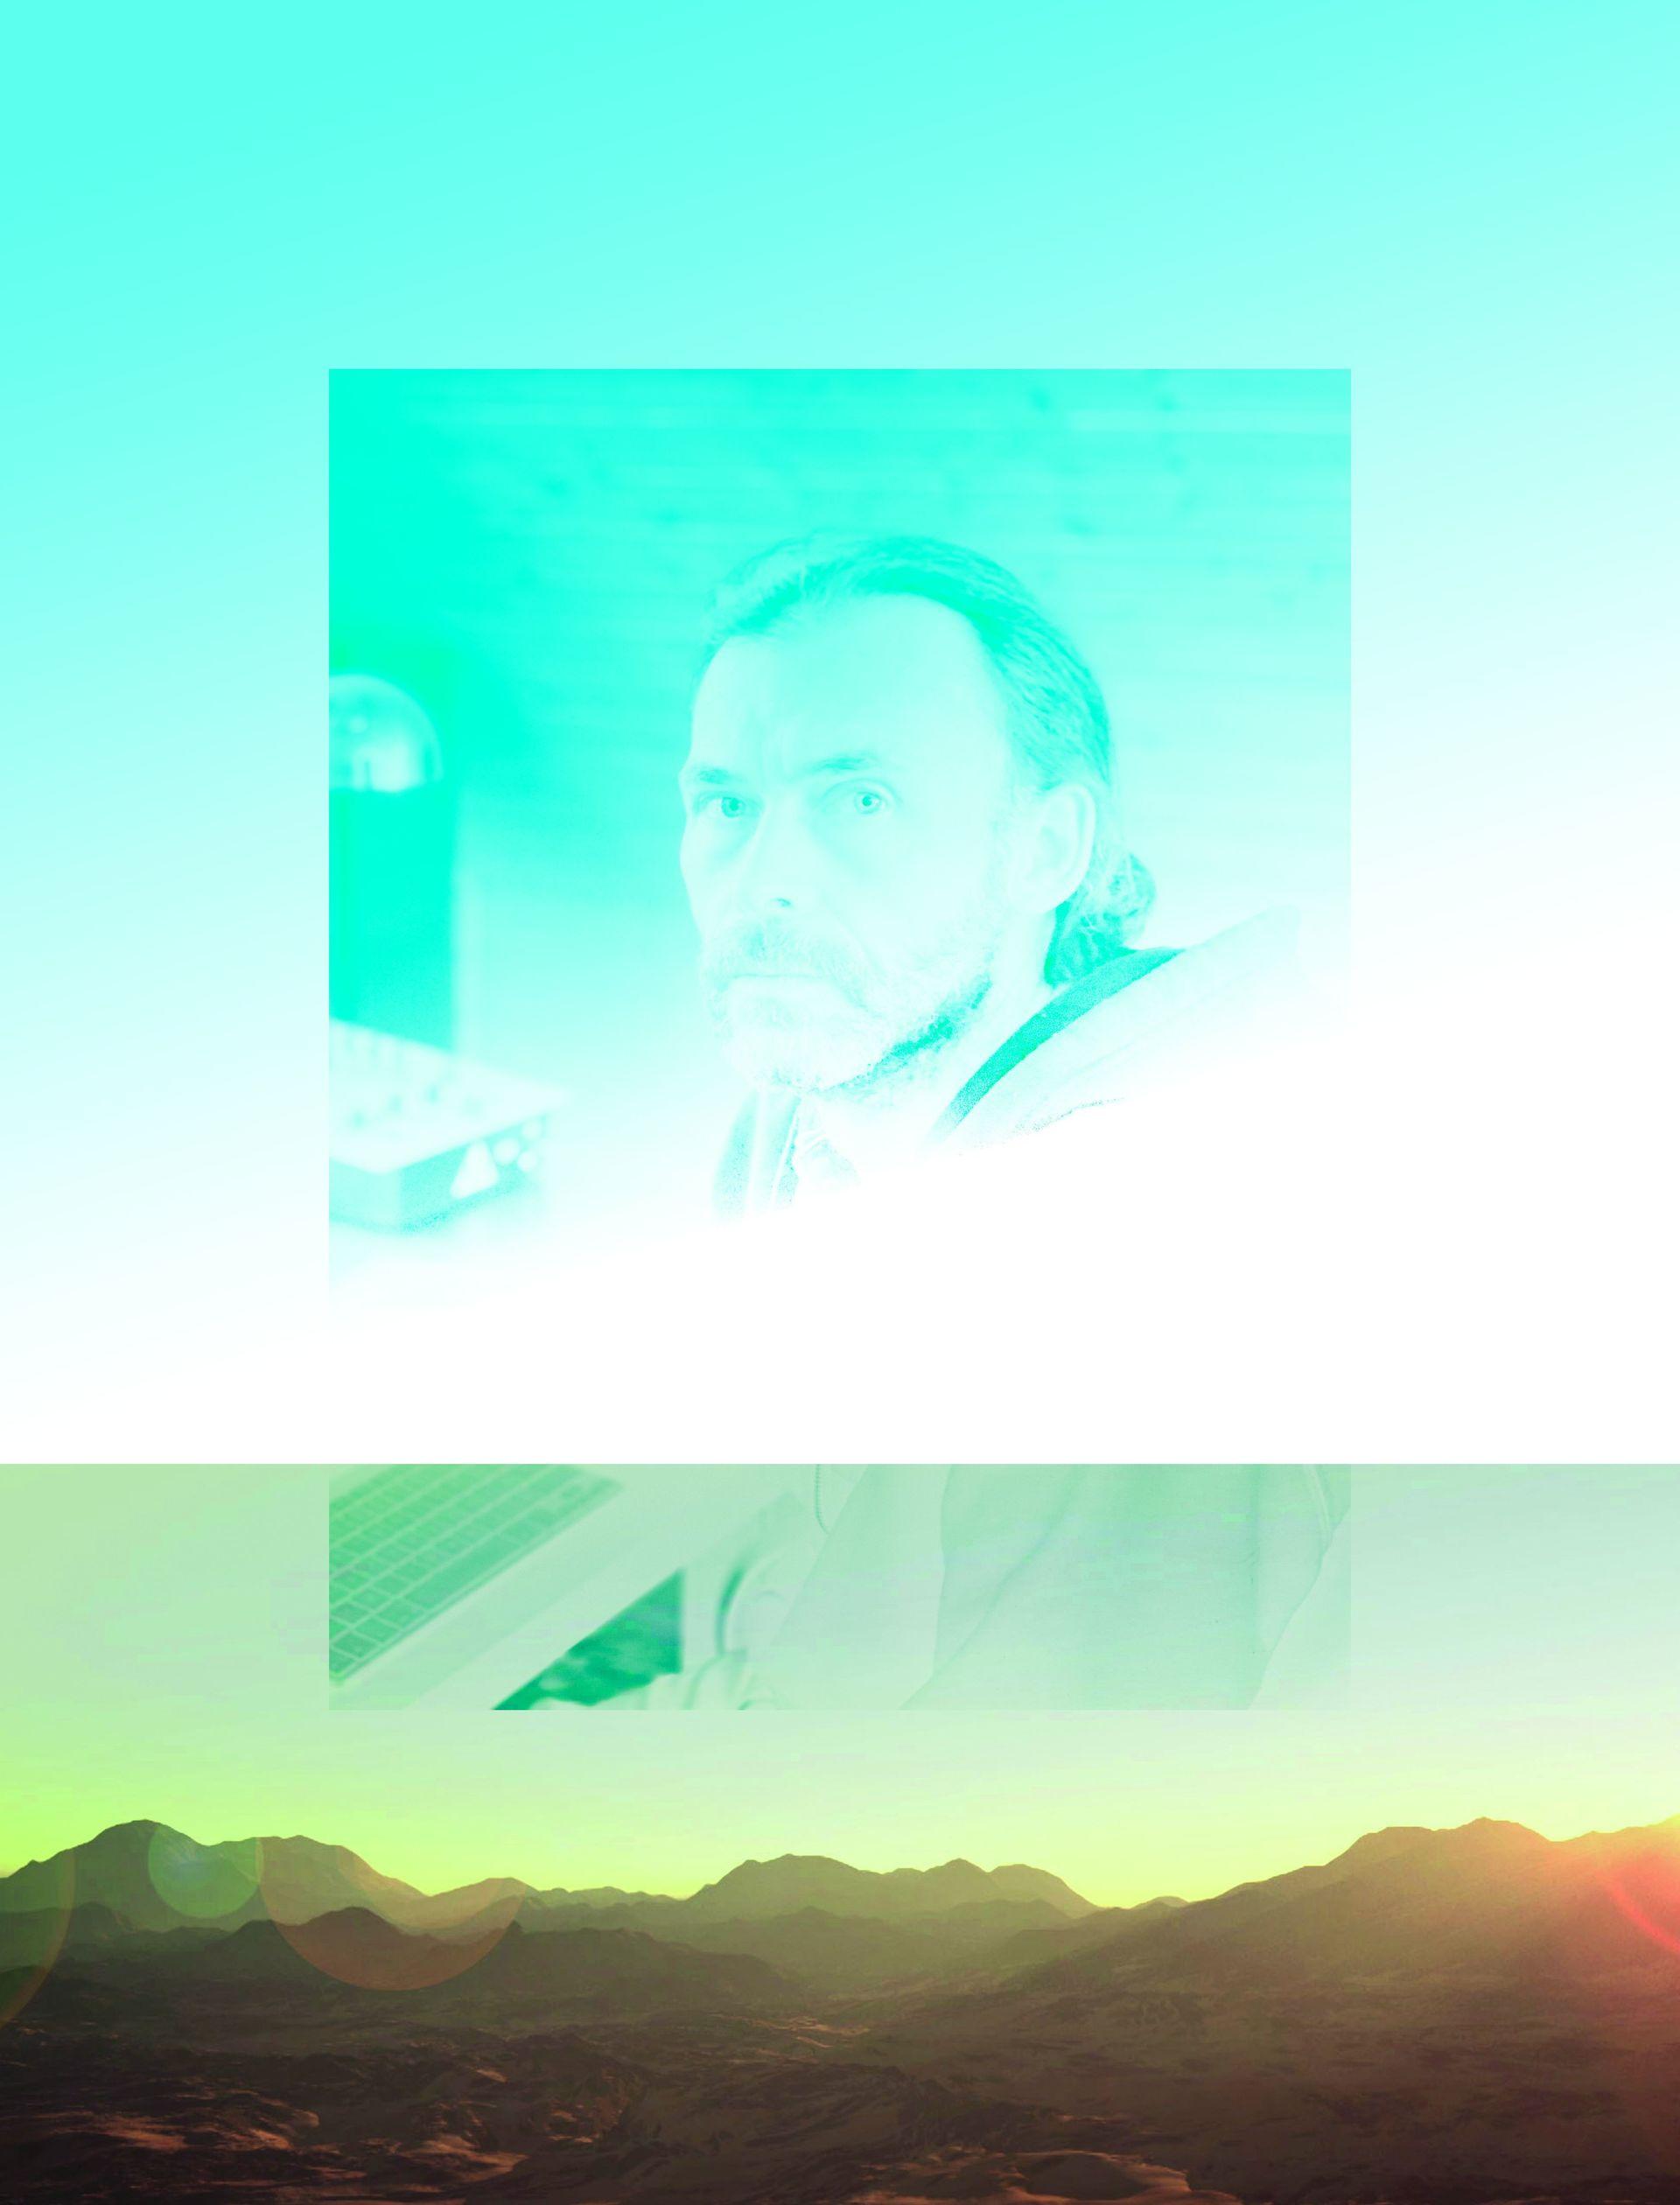 P_MRKUS_FINAL1 (1).jpg